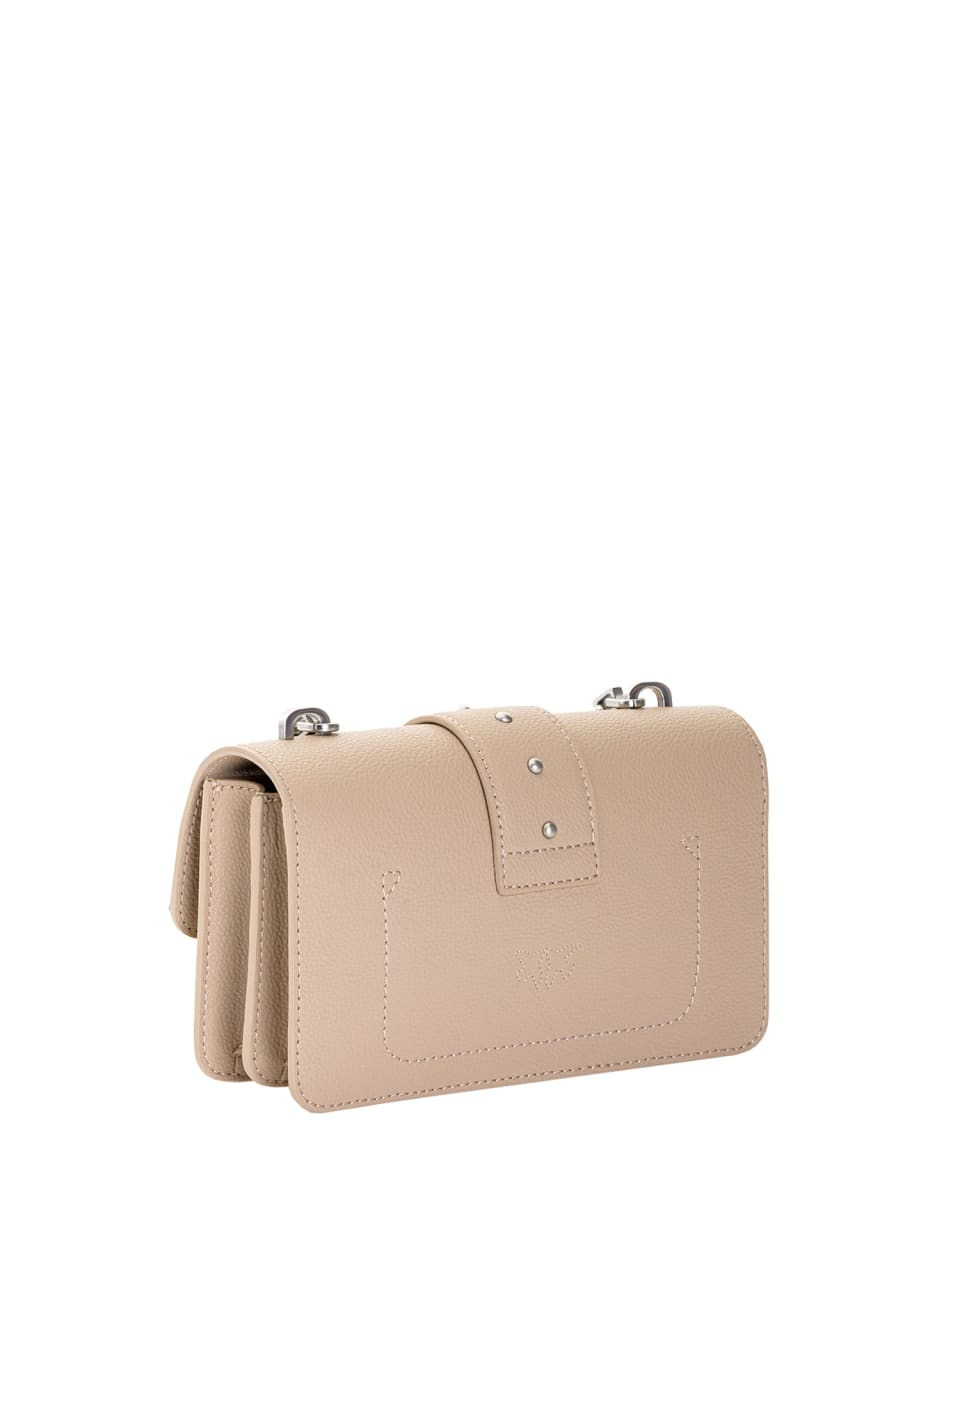 Mini Love Bag Simply in tumbled leather